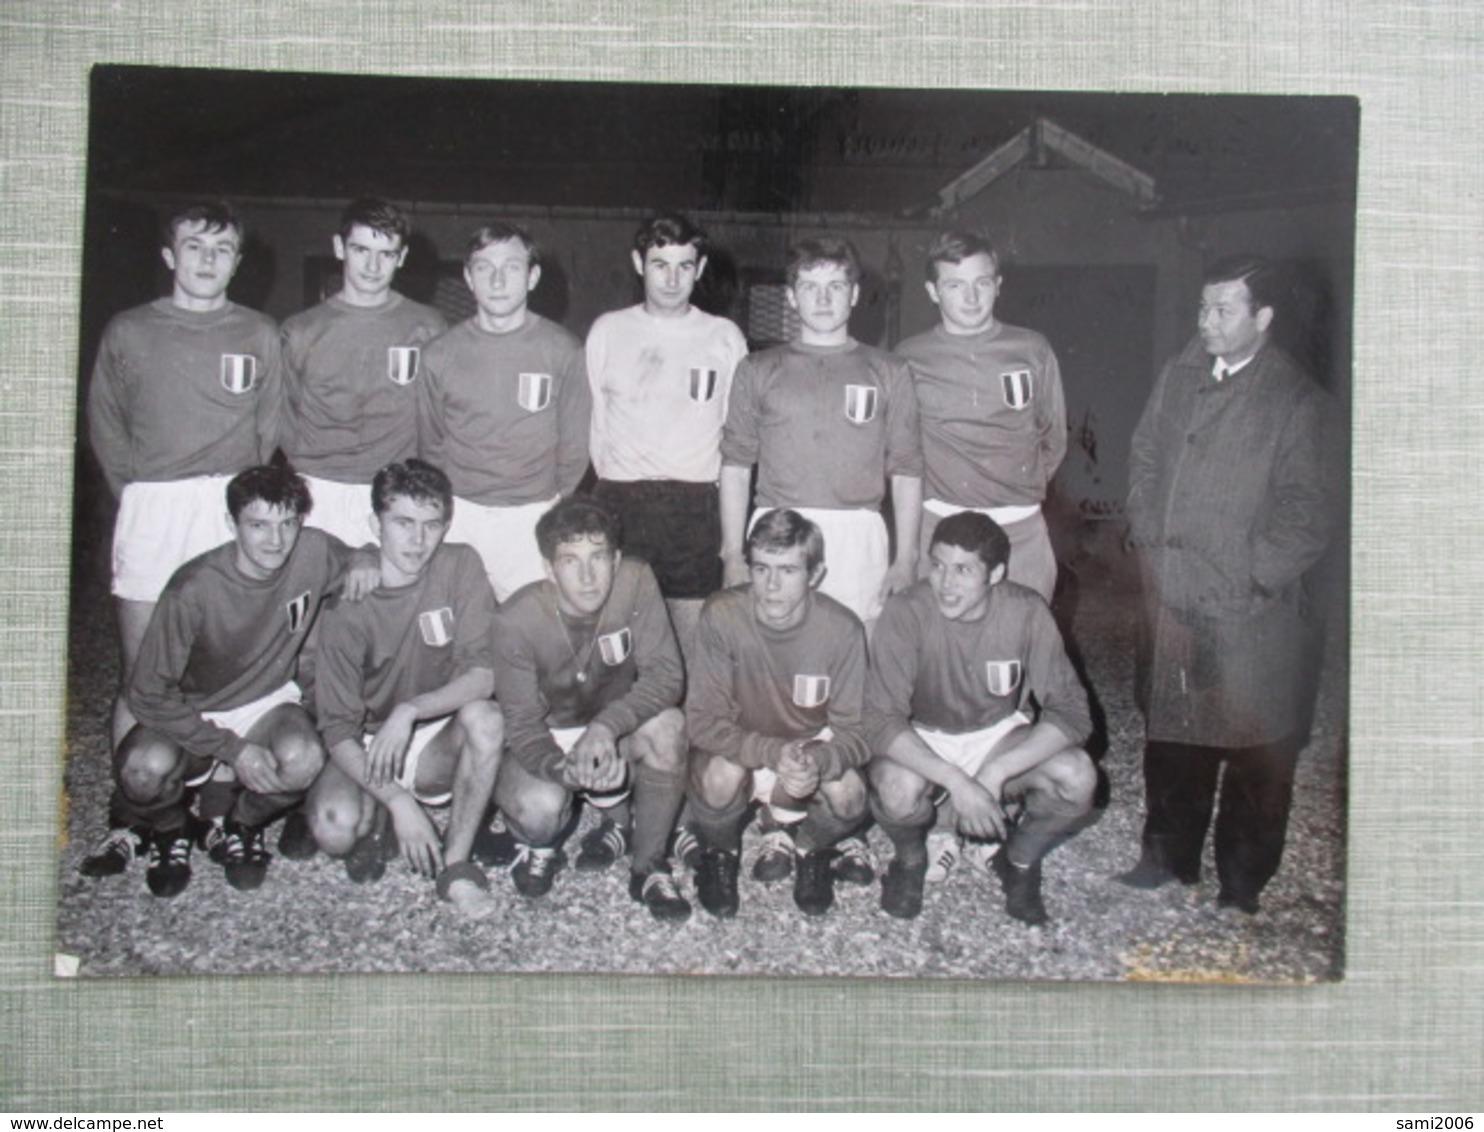 GRANDE PHOTO EQUIPE DE FOOT EQUIPE DE FRANCE JUNIORS  SAISON 1966-67 - Sporten